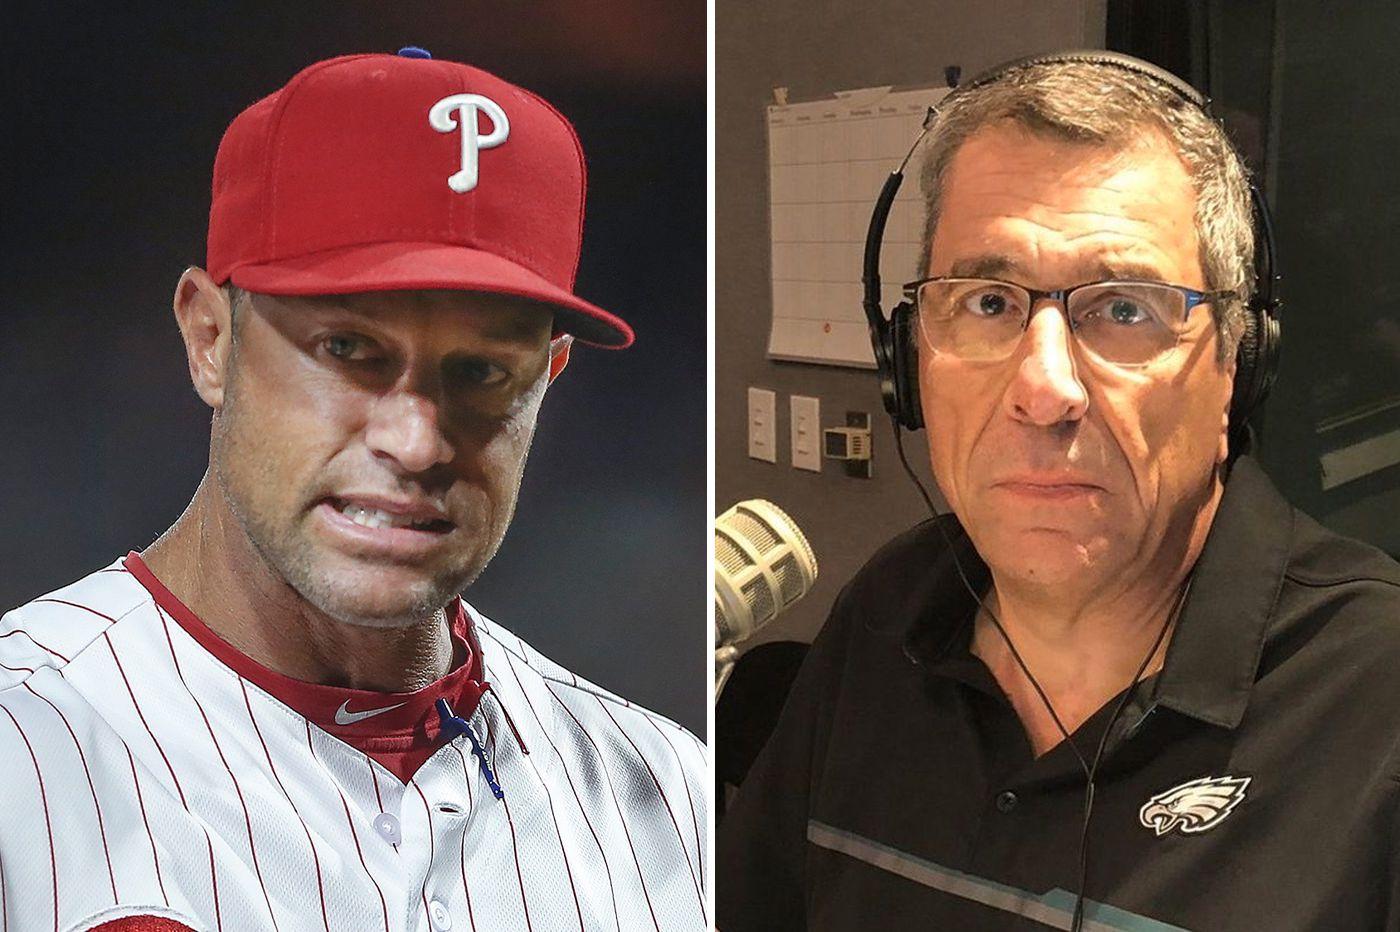 Phillies' Gabe Kapler, WIP's Angelo Cataldi both a little bit right and a little bit wrong | Mike Sielski